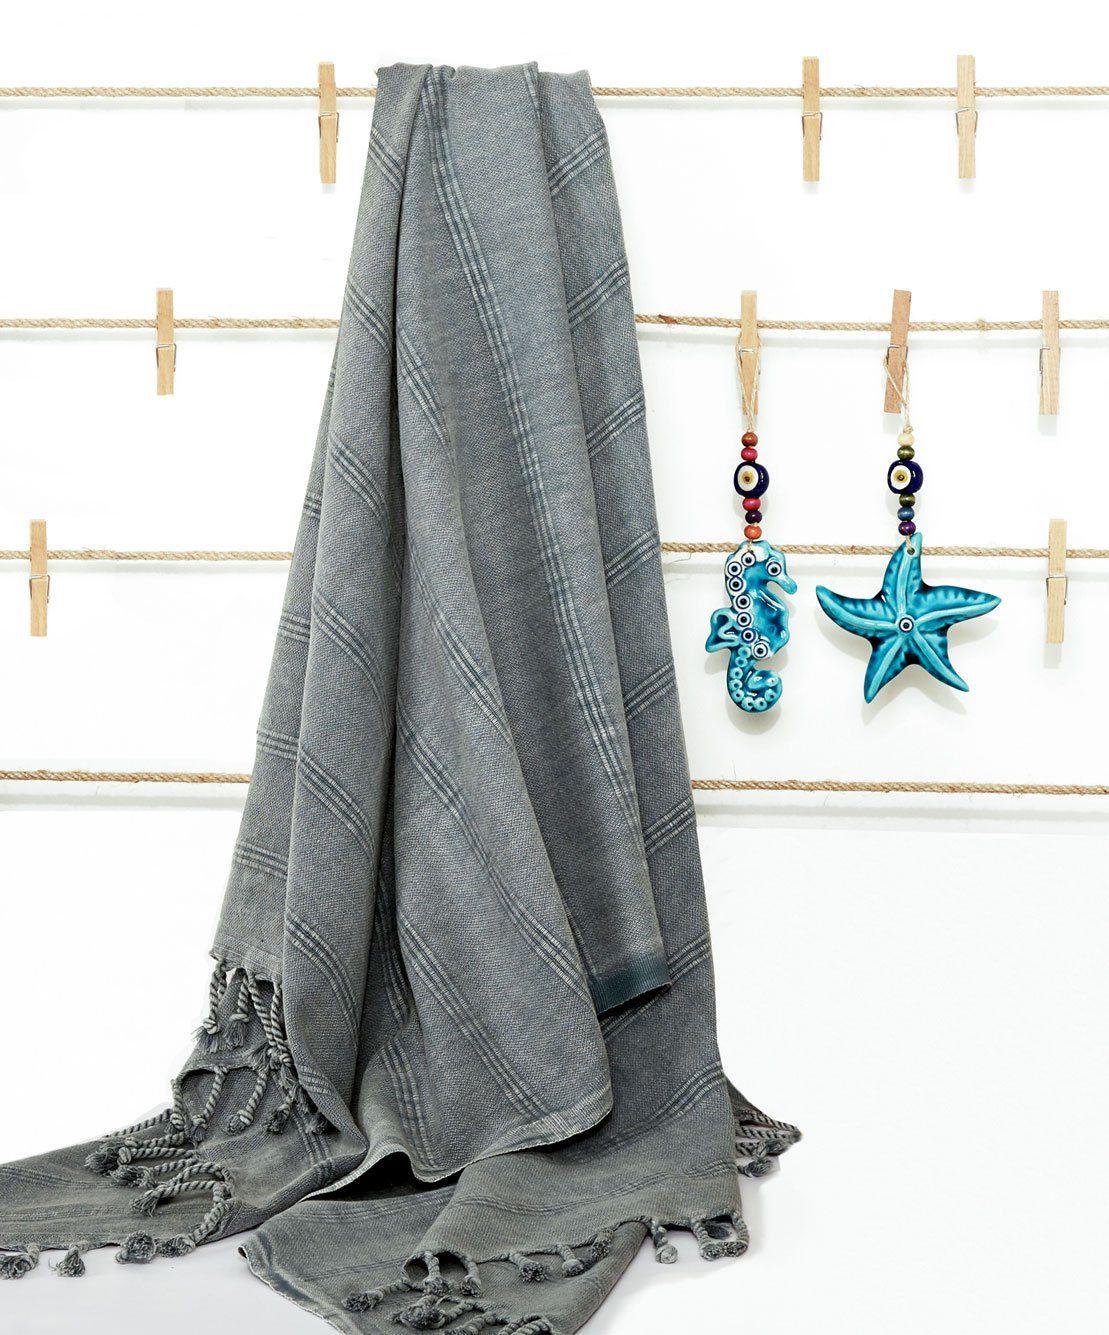 Stonewashed Cotton Turkish Towels With Fringes Turkish Towels